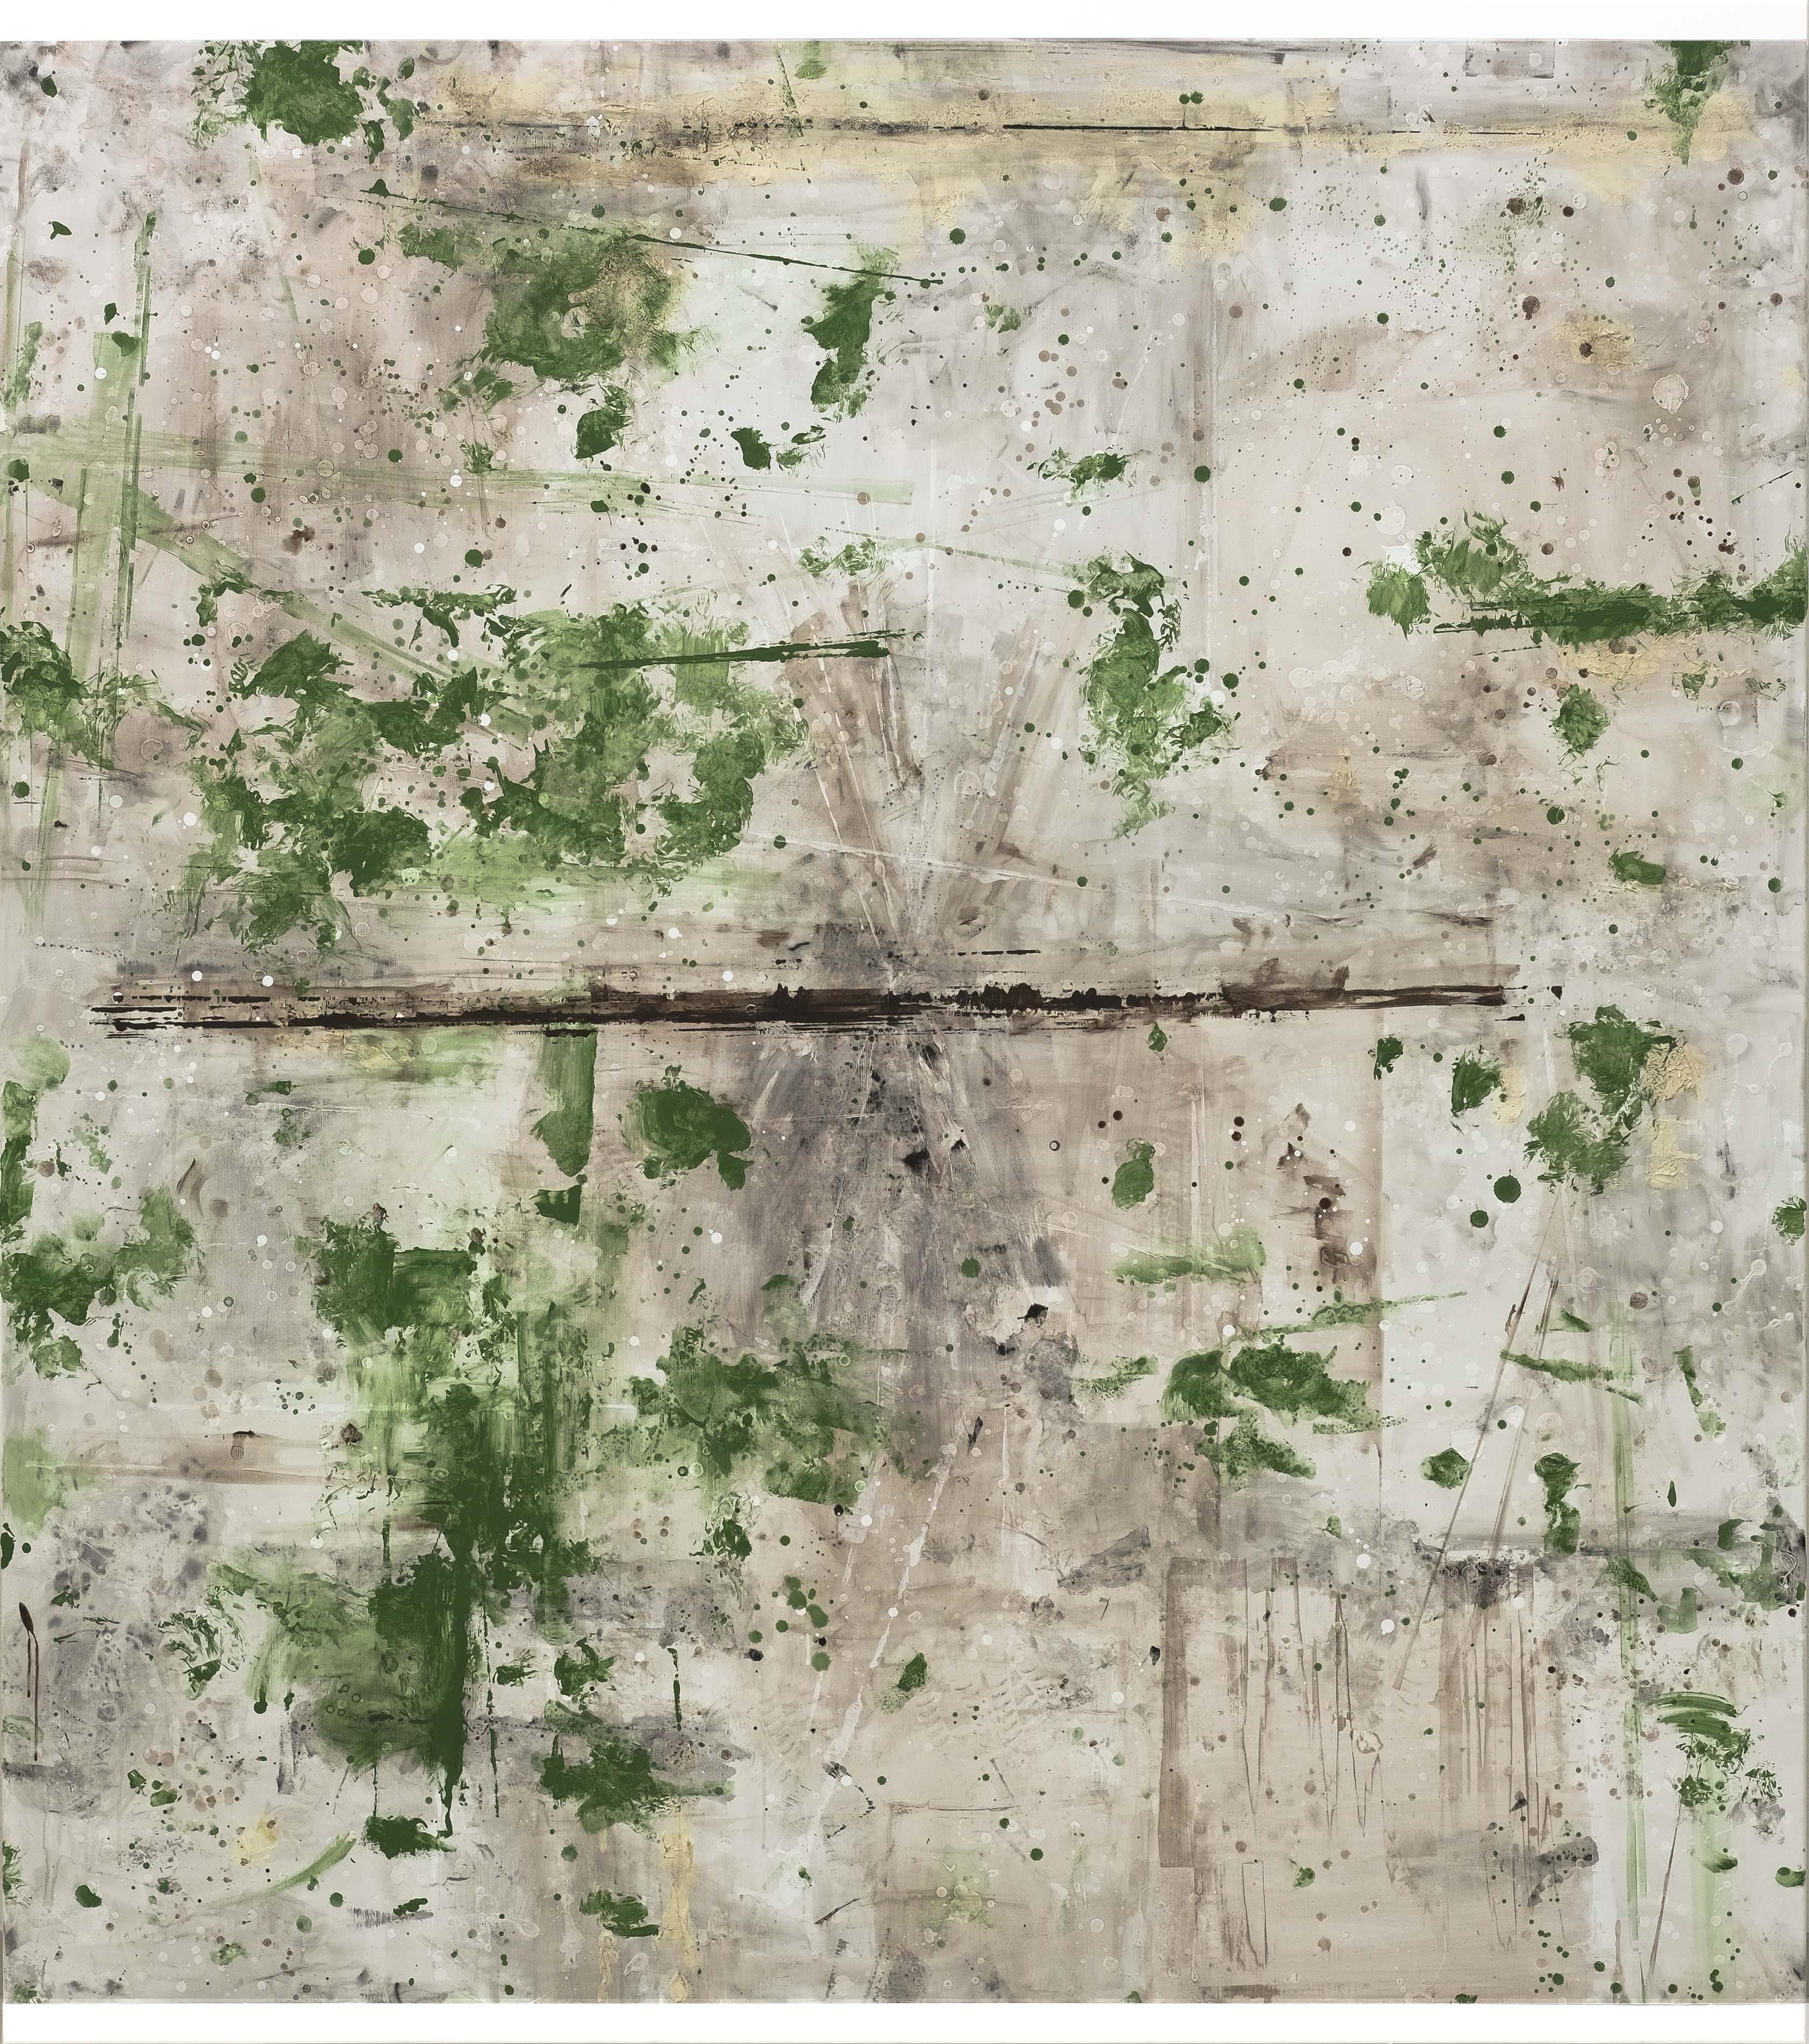 Untitled, 2017, acrylic on canvas, 250 x 220 cm